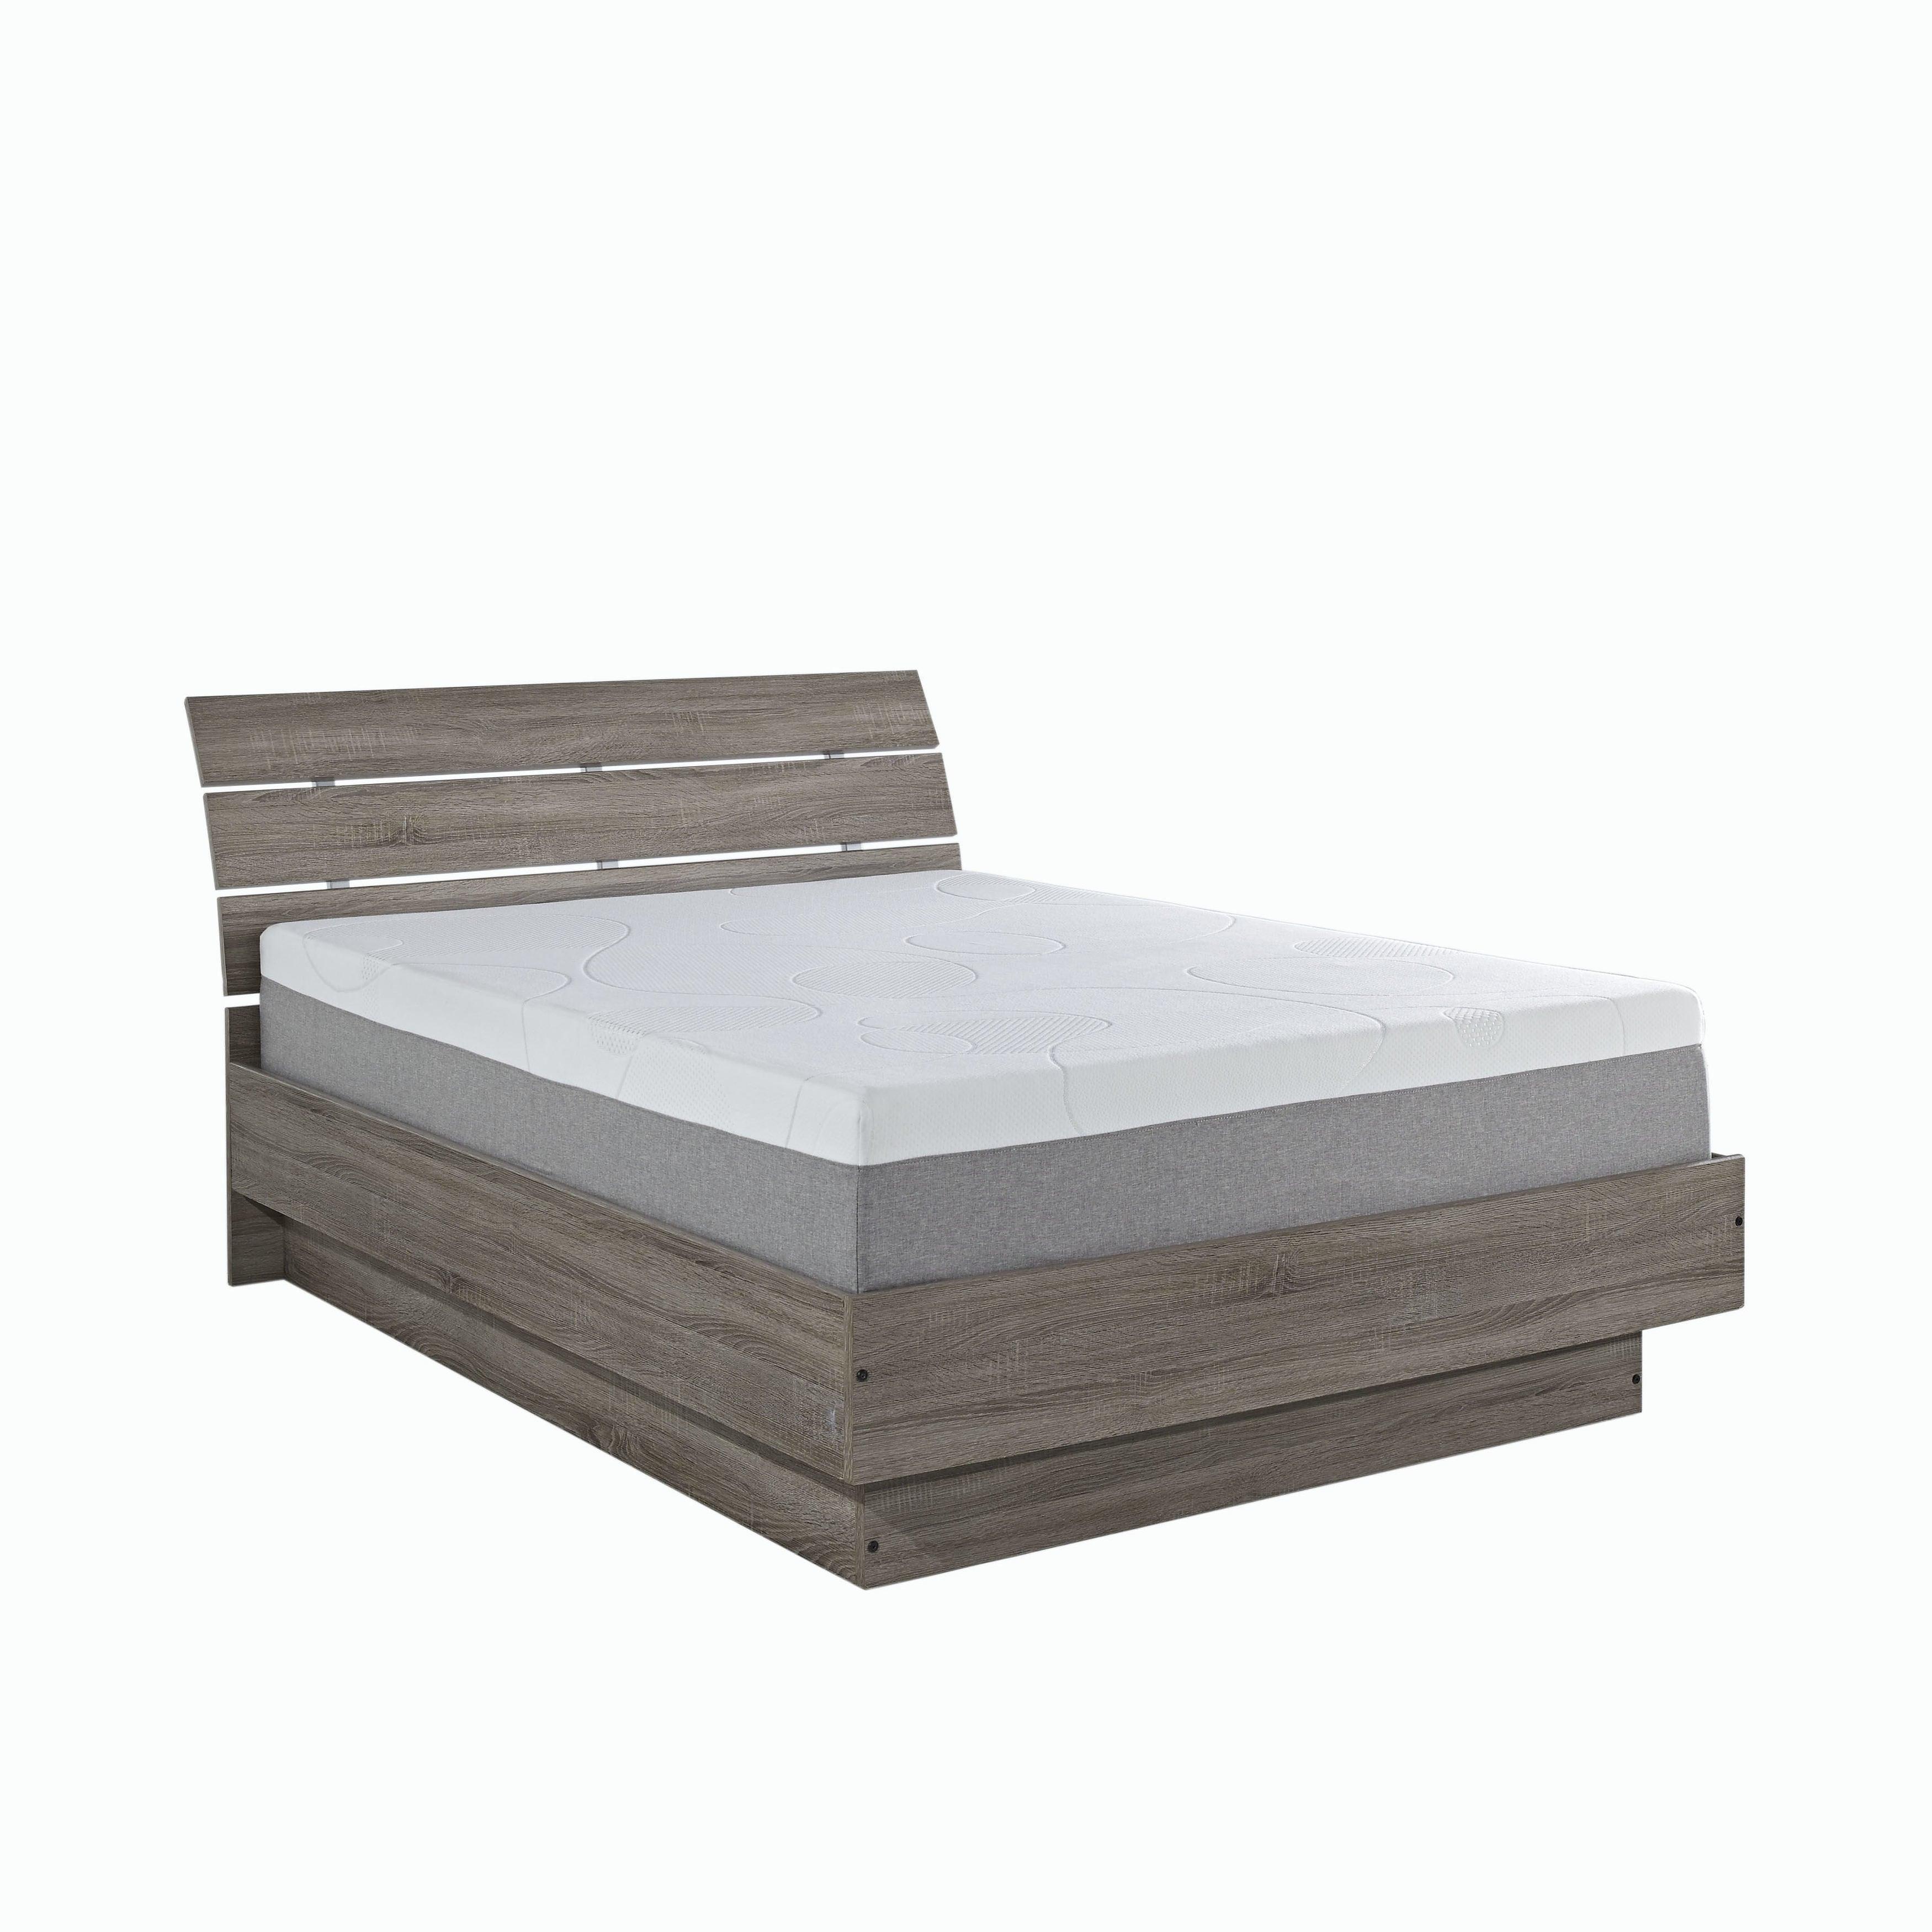 Slumber Solutions Choose Your Comfort 14-inch King-size Gel Memory ...